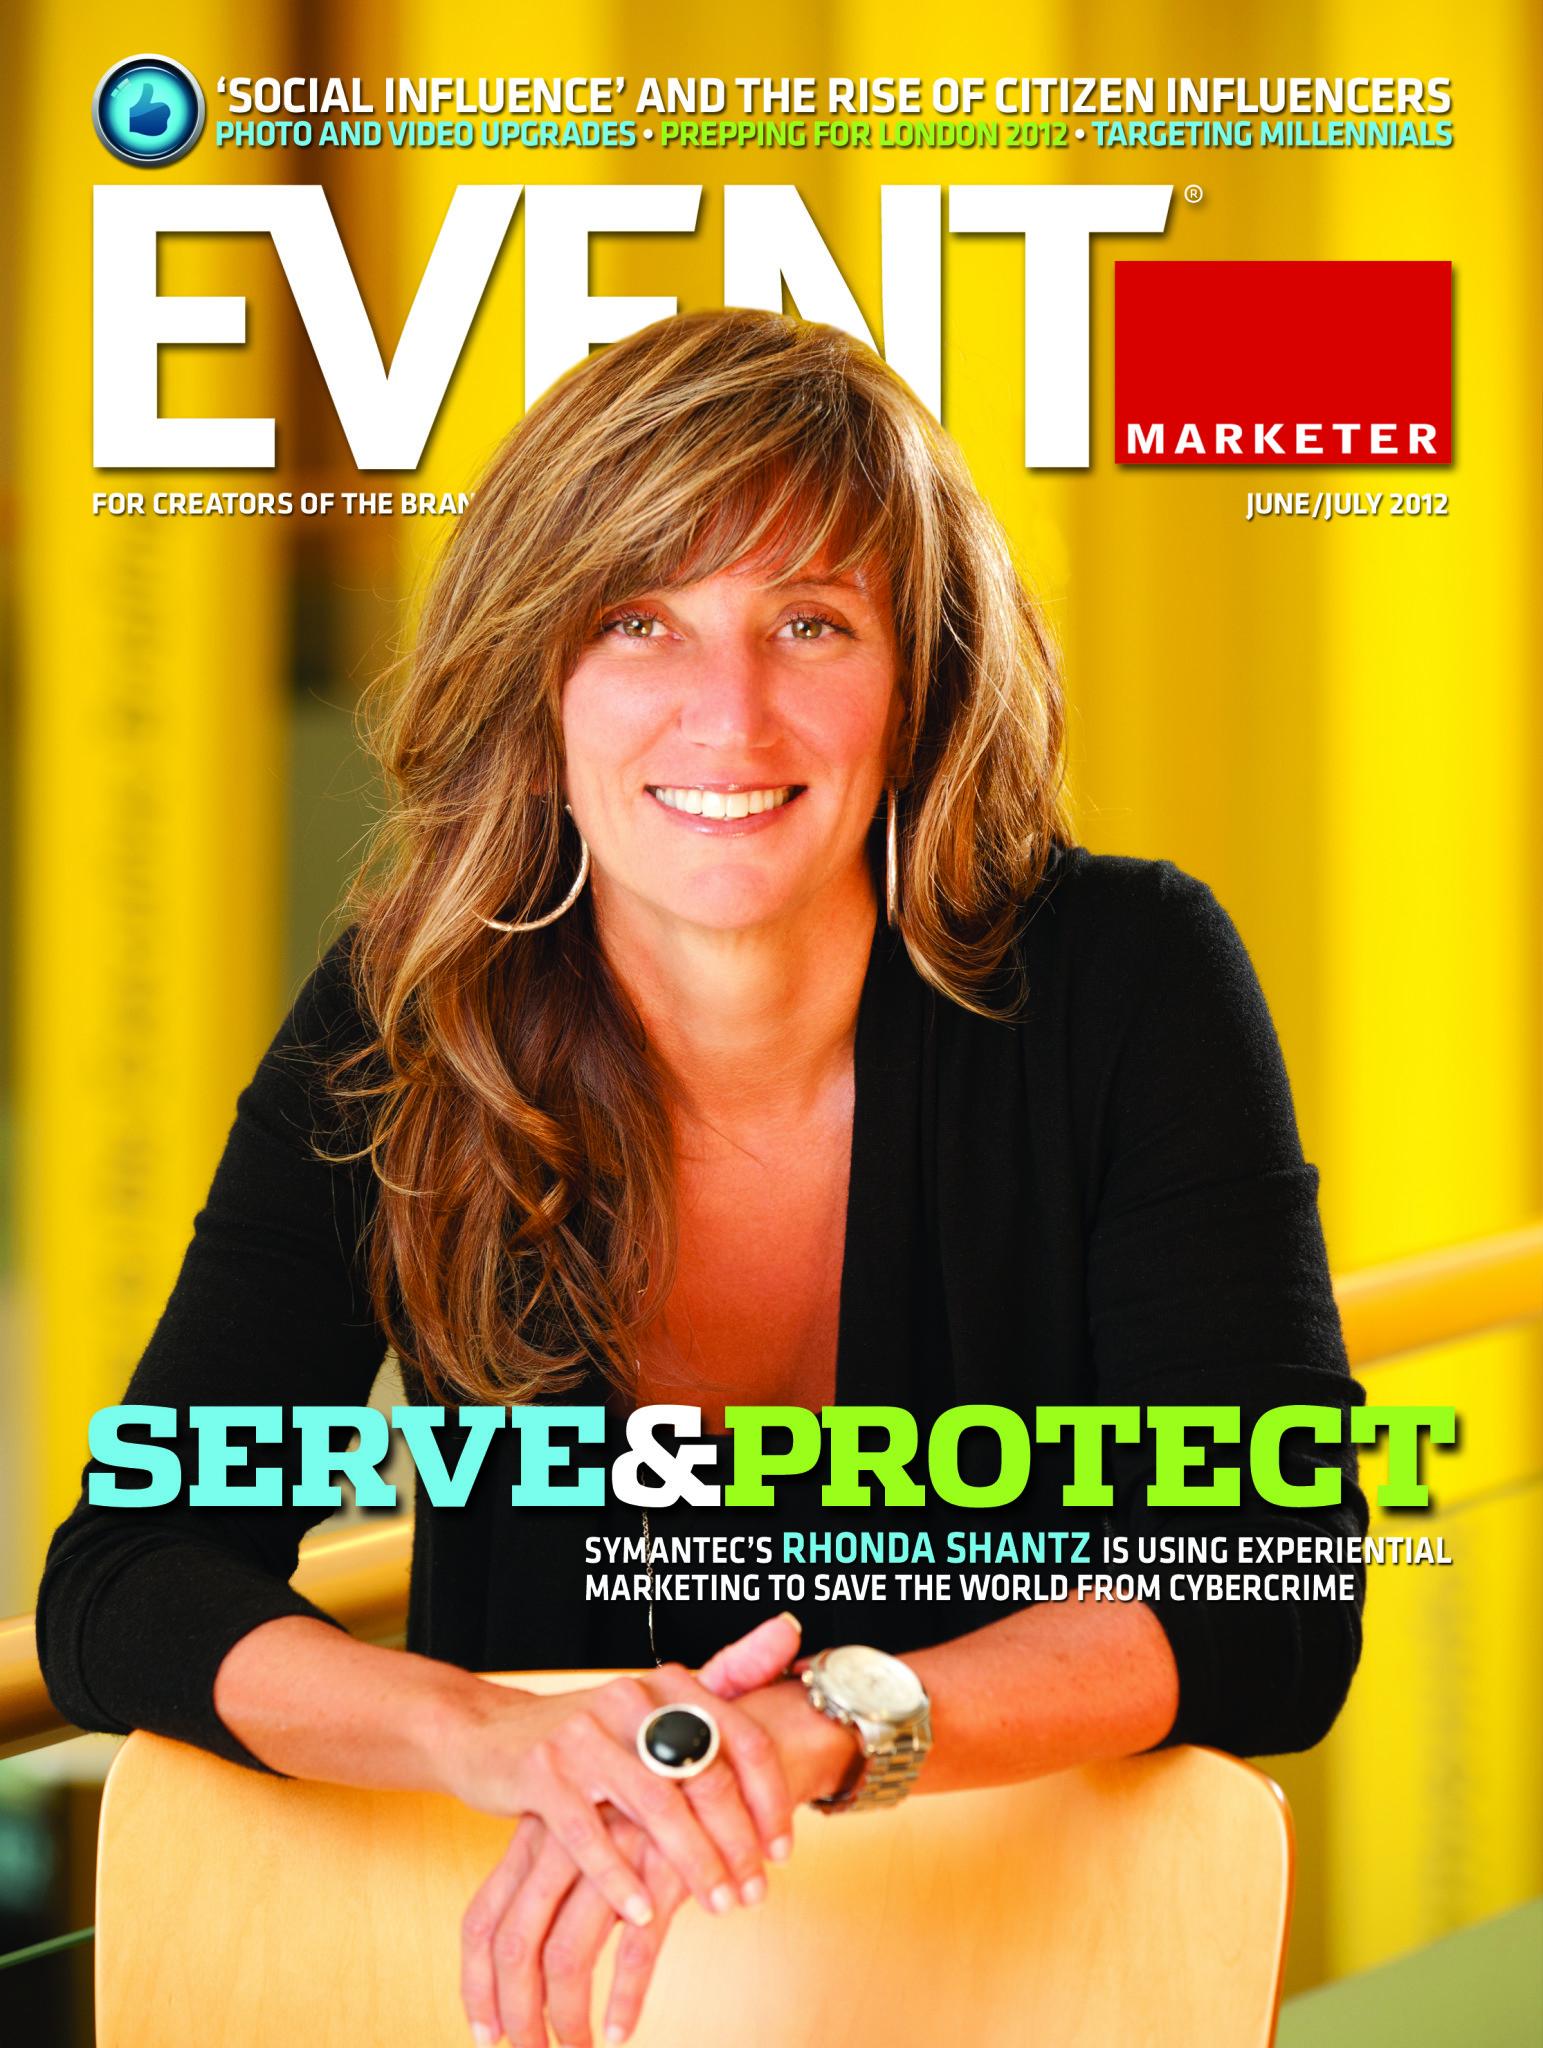 Event Marketer June/July 2012